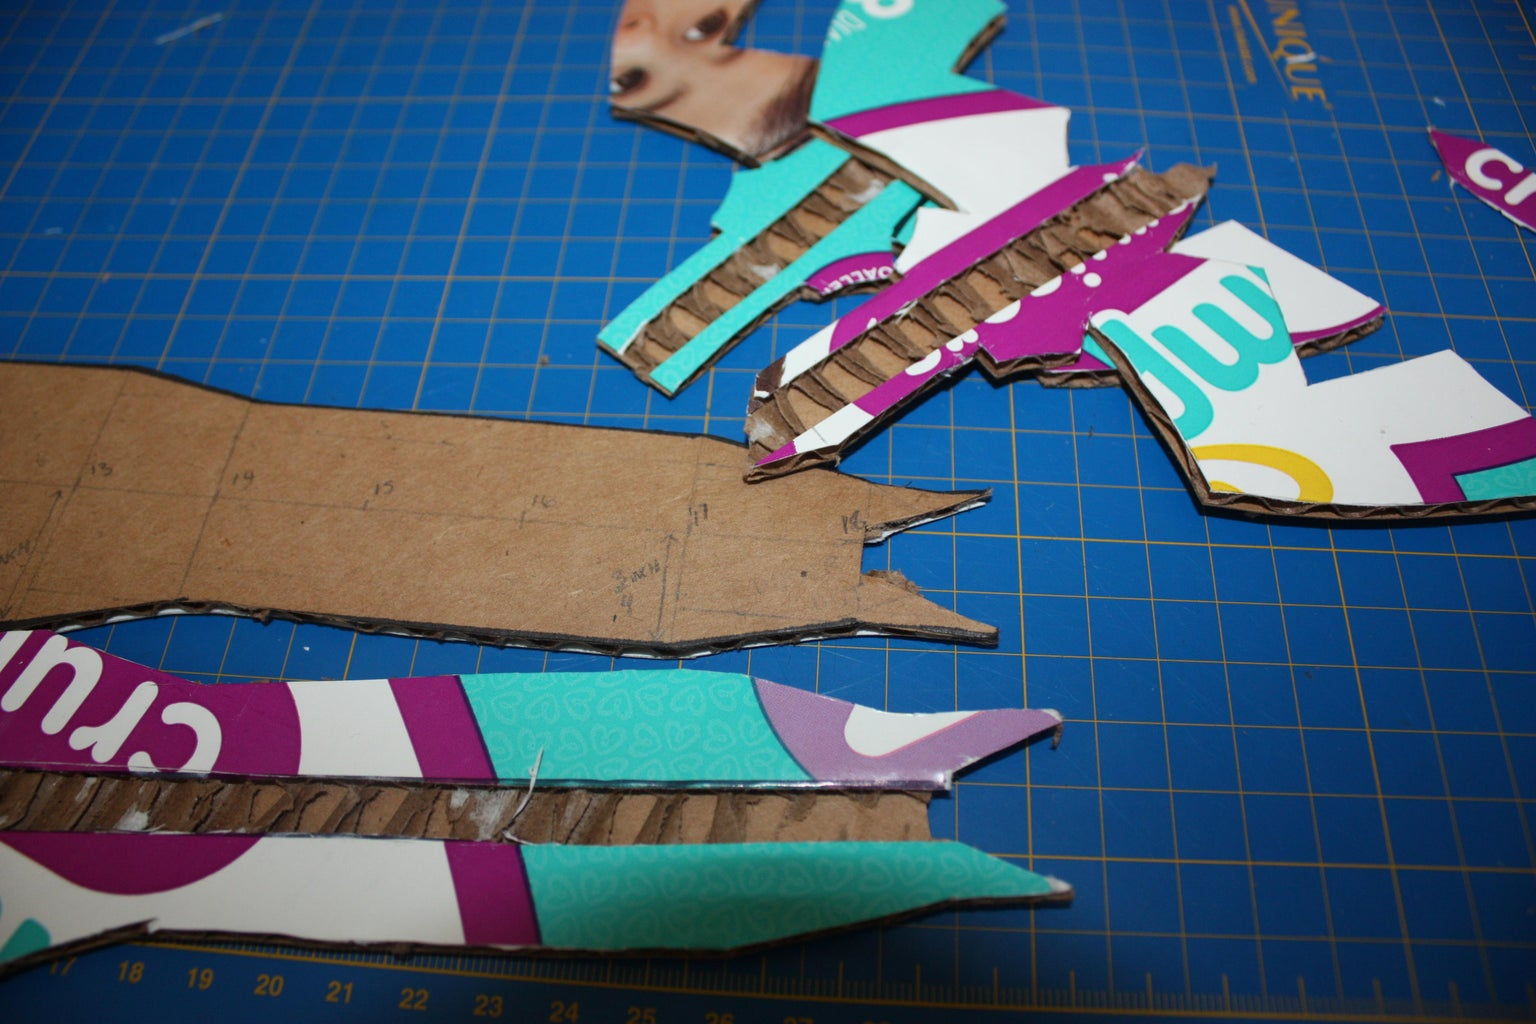 Optional Step: Adding a Wooden Dowel